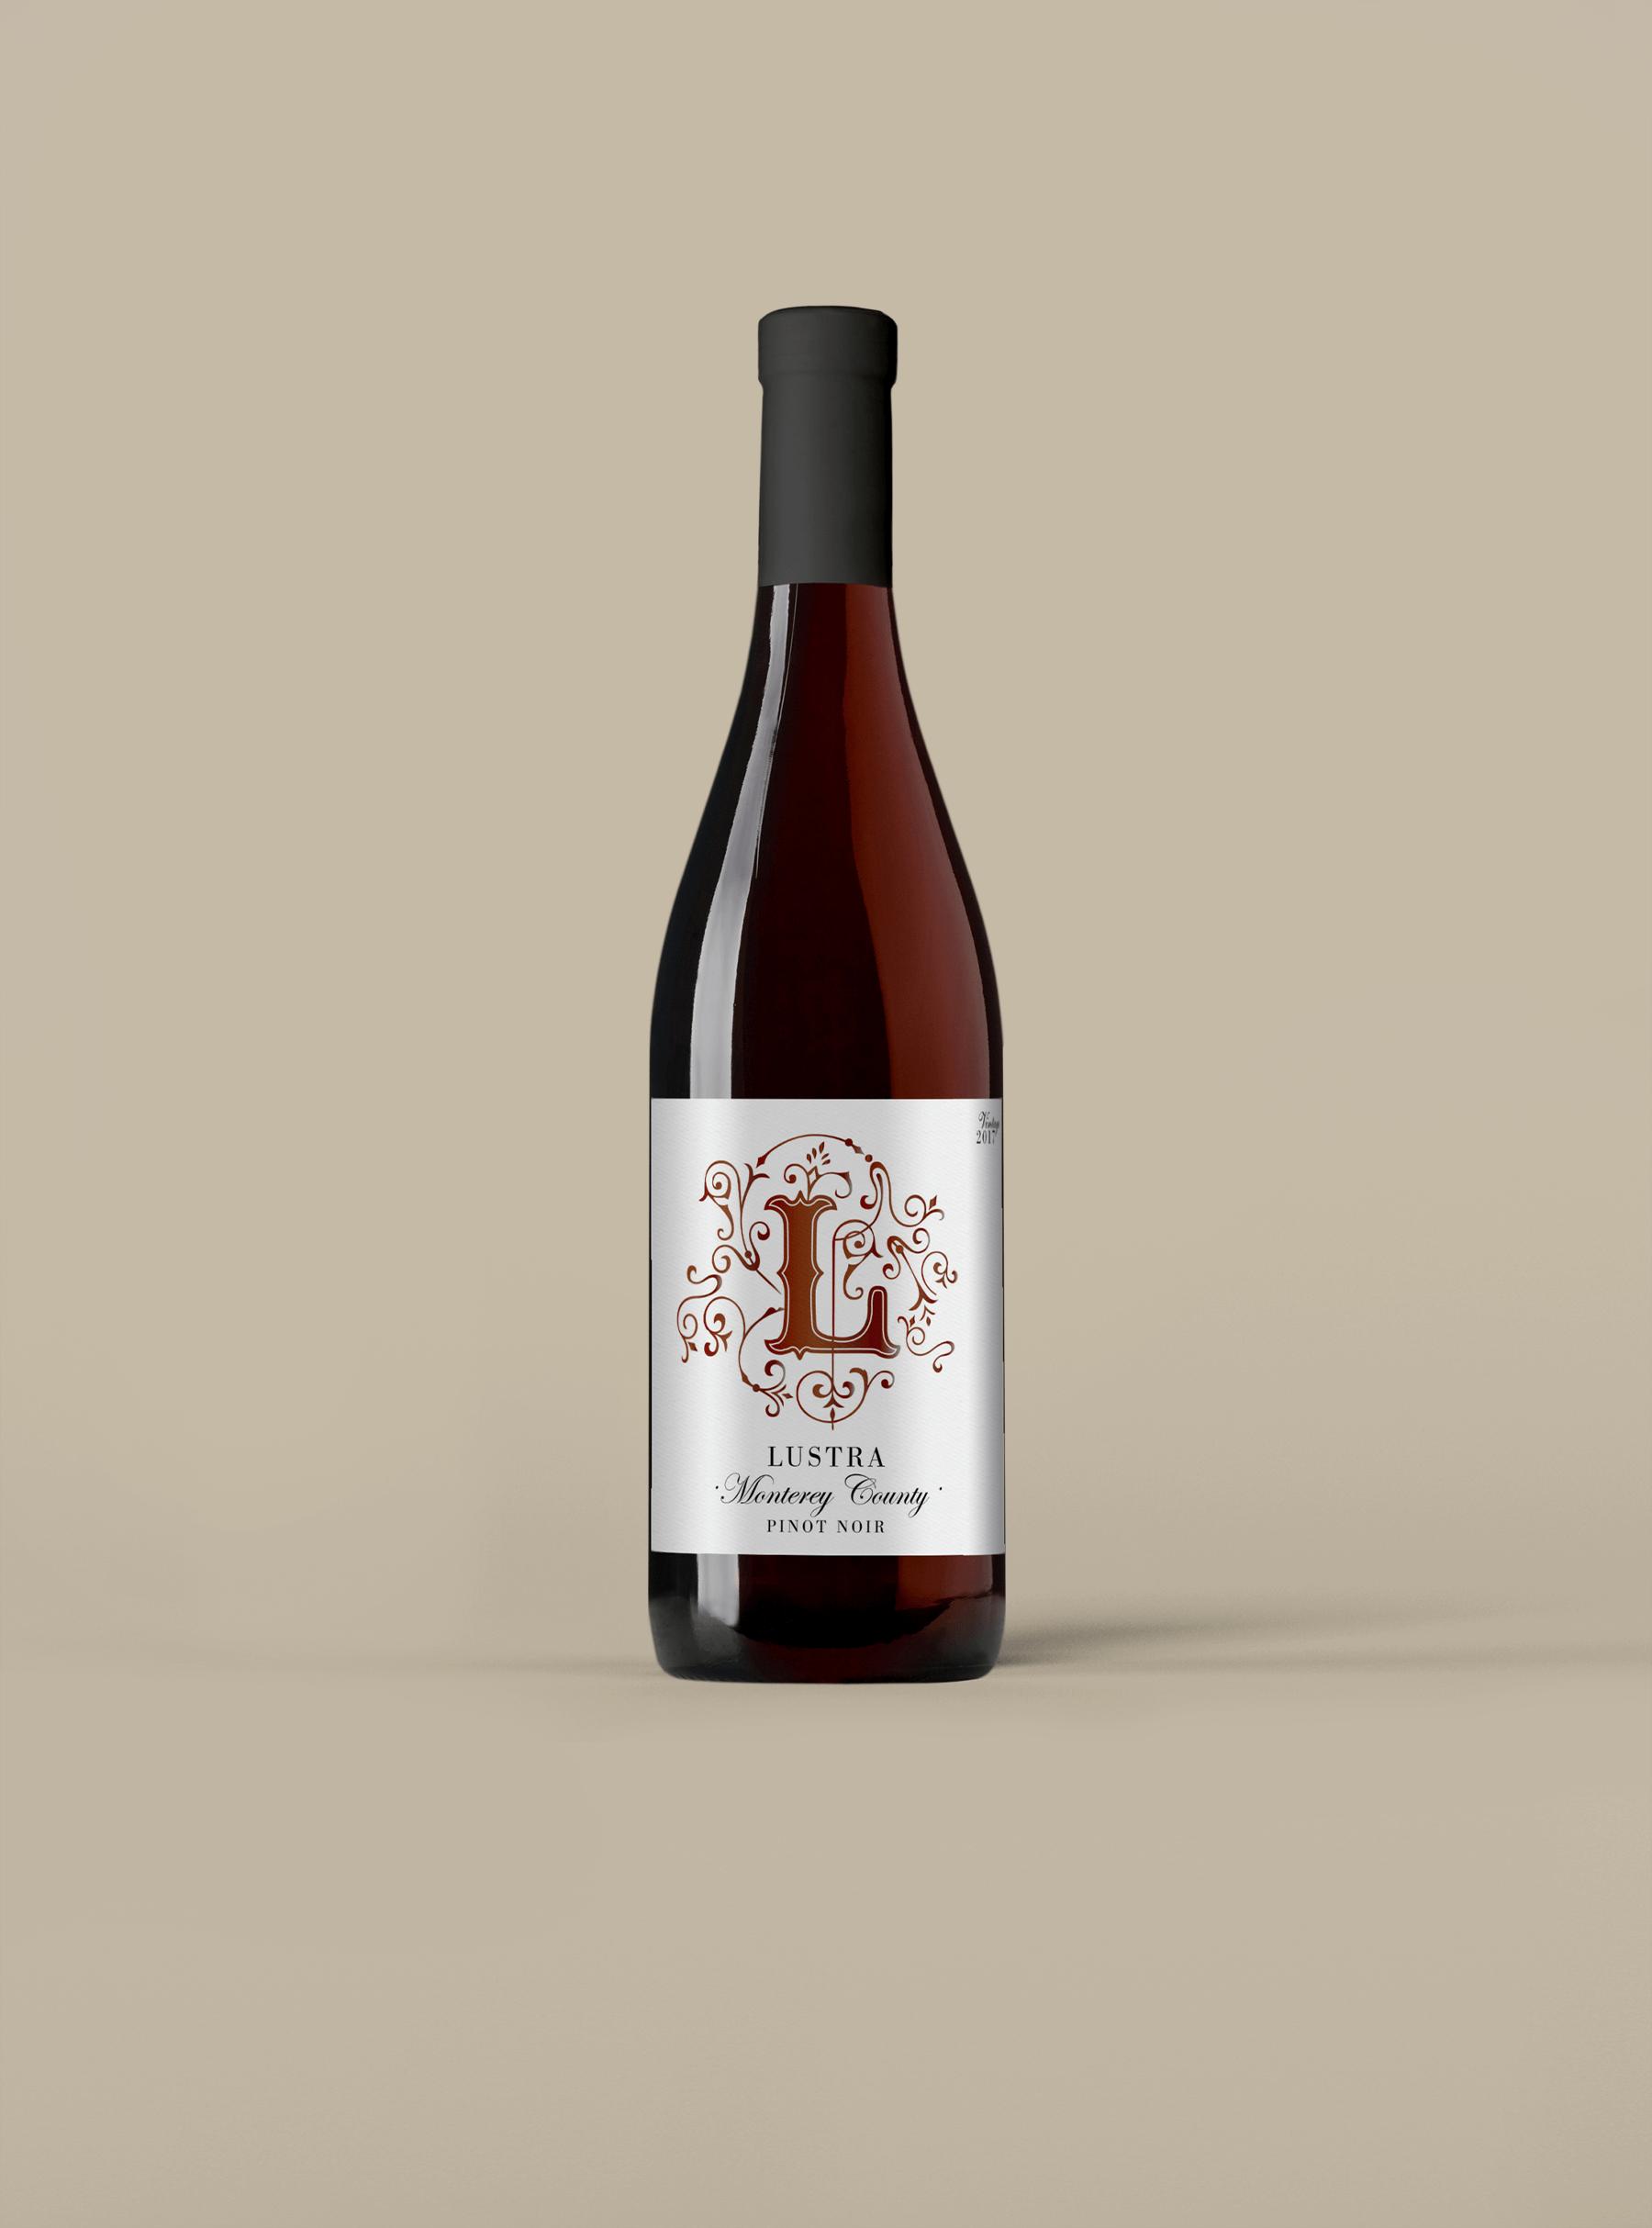 Lustra Monterey County Pinot Noir